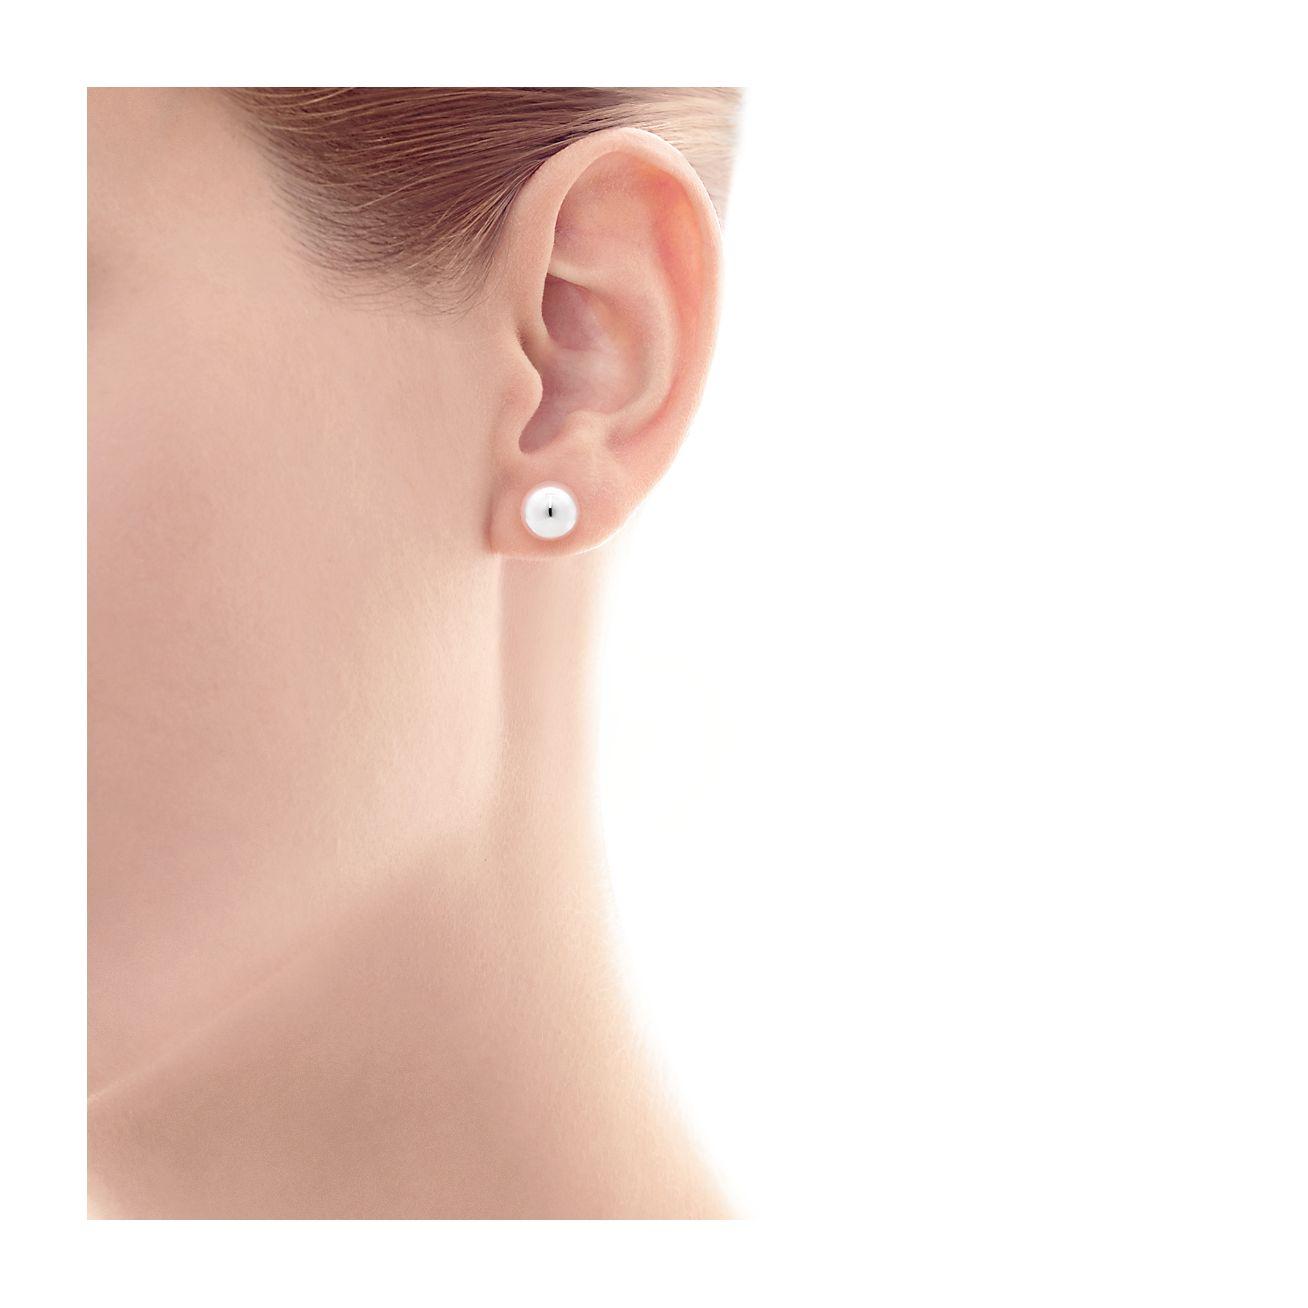 Sterling Silver Ball Stud Earrings Silver ball studs 925 Black diamonds Studs Tiny Silver stud earrings Sterling Silver Ball Earrings